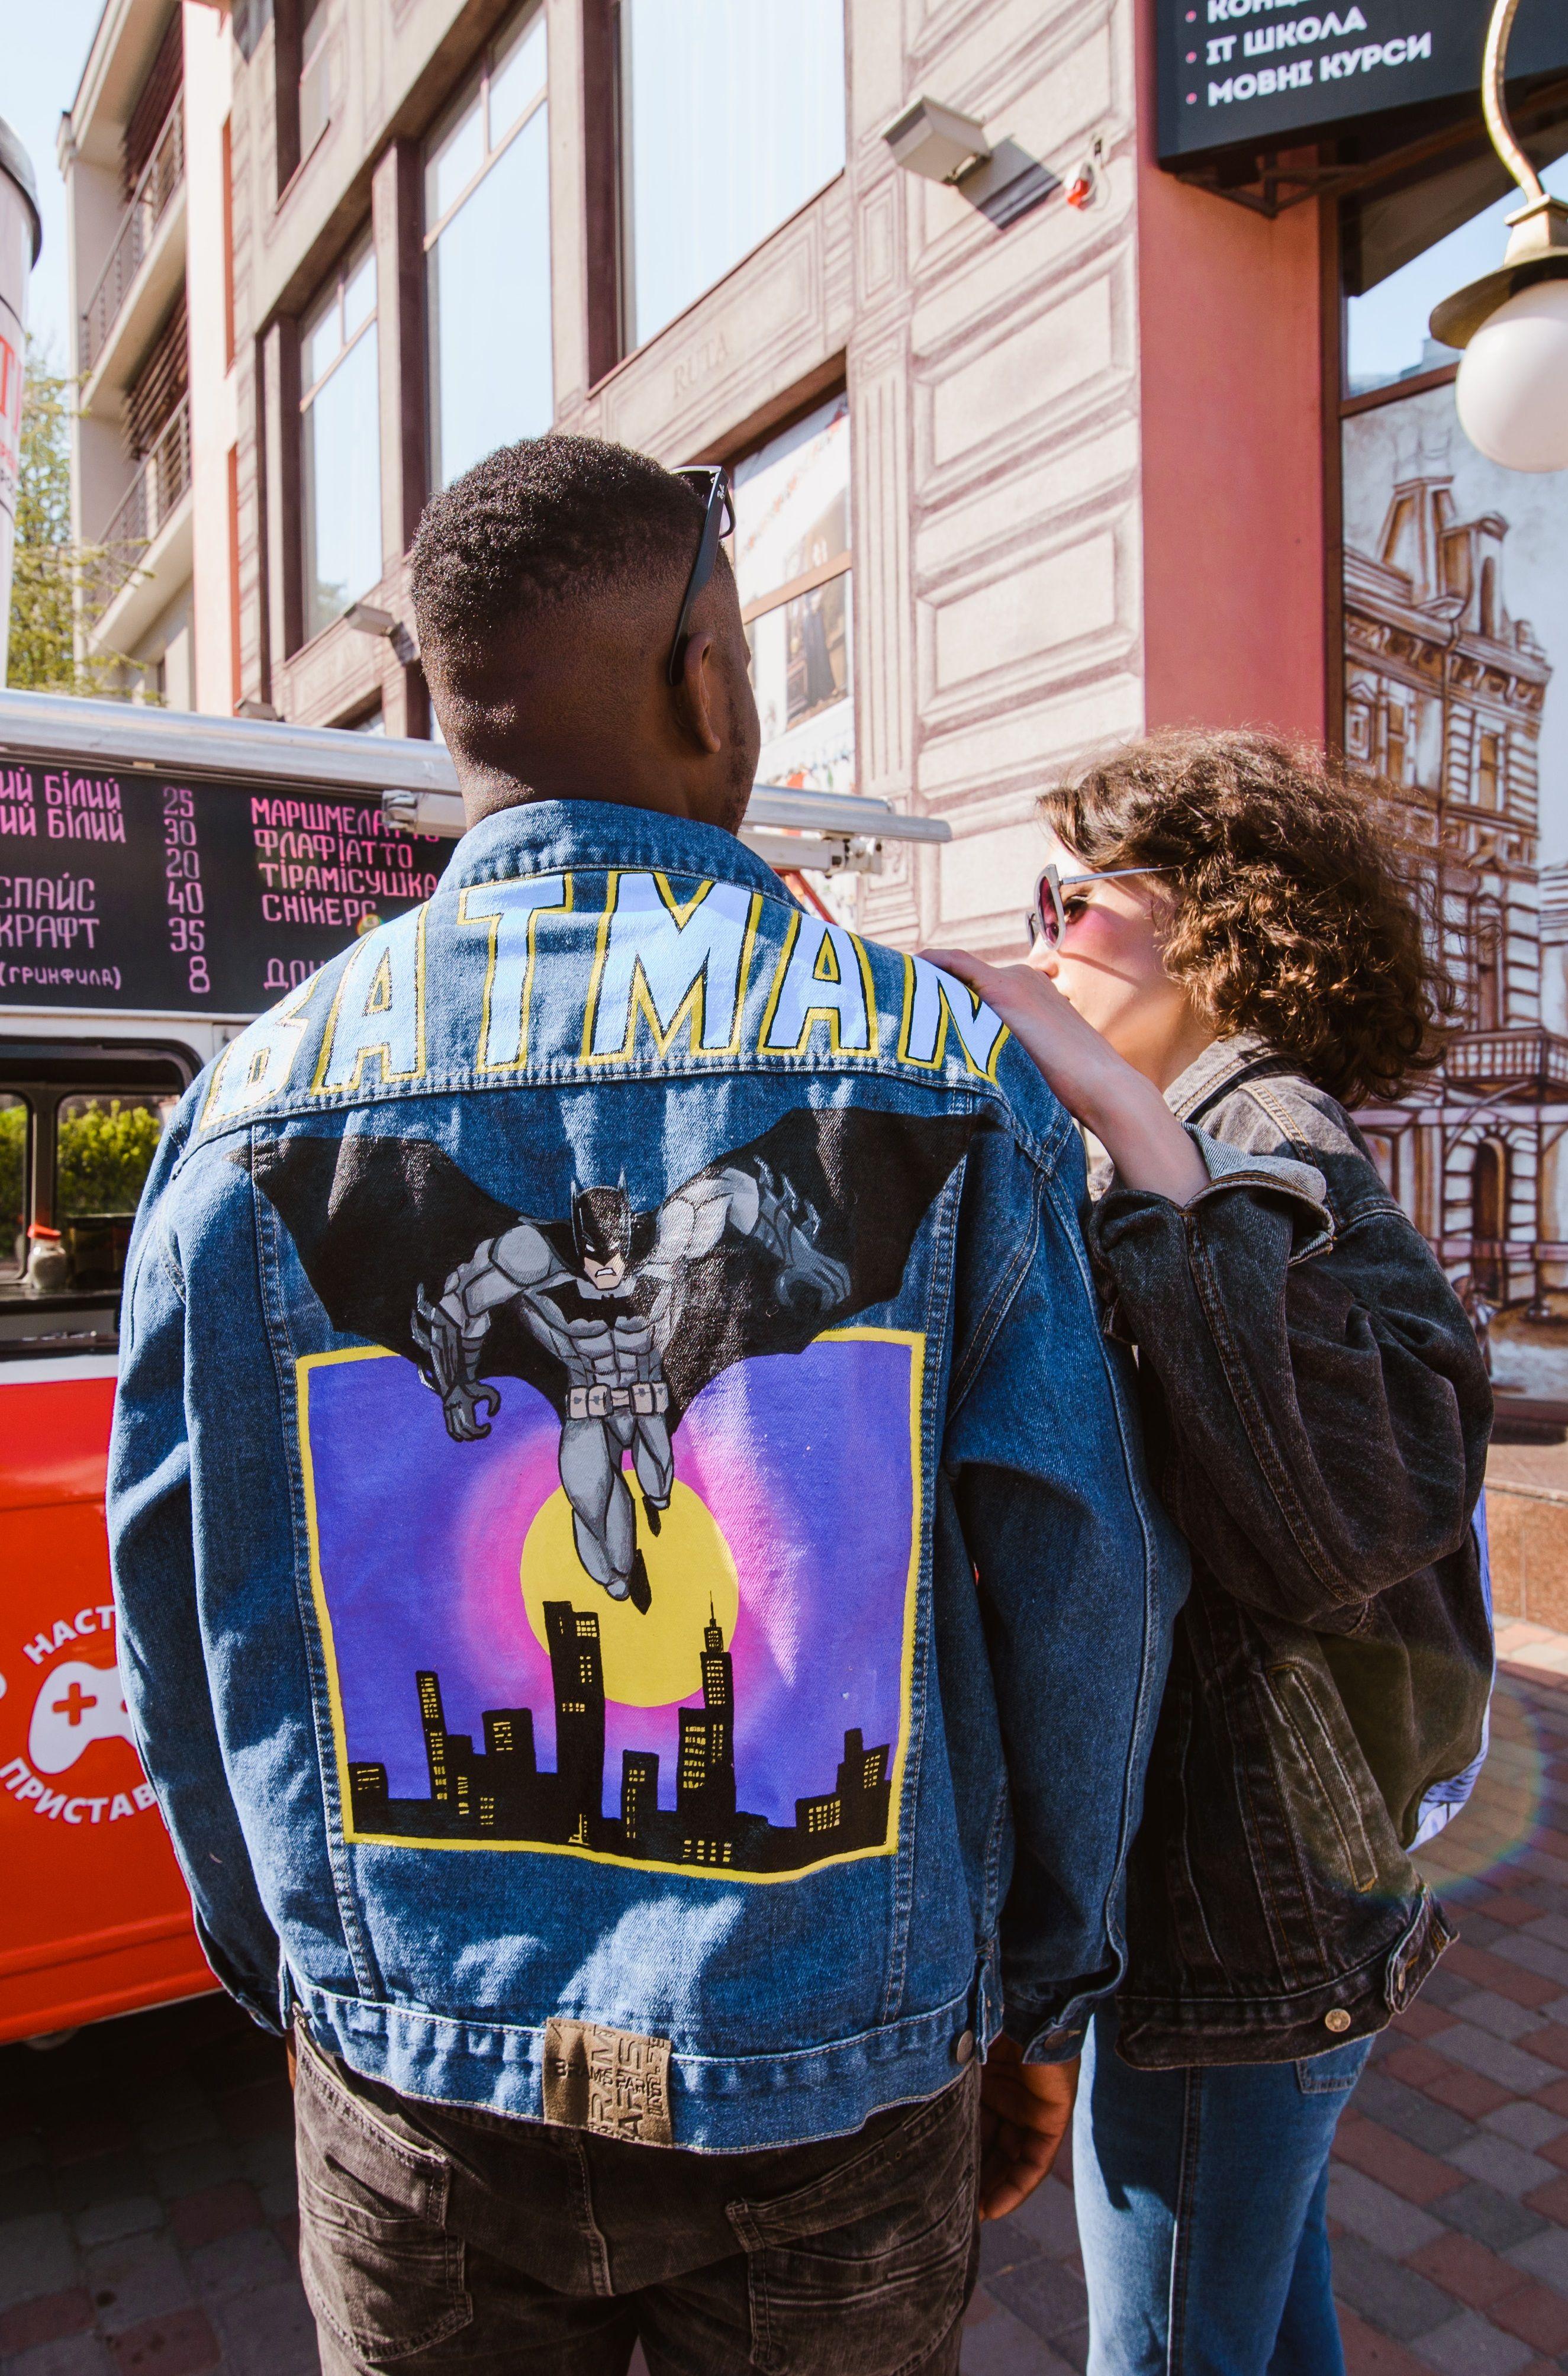 Man S Painted Denim Jacket Comic Bat Etsy In 2021 Diy Denim Jacket Painted Denim Painted Denim Jacket [ 4014 x 2649 Pixel ]